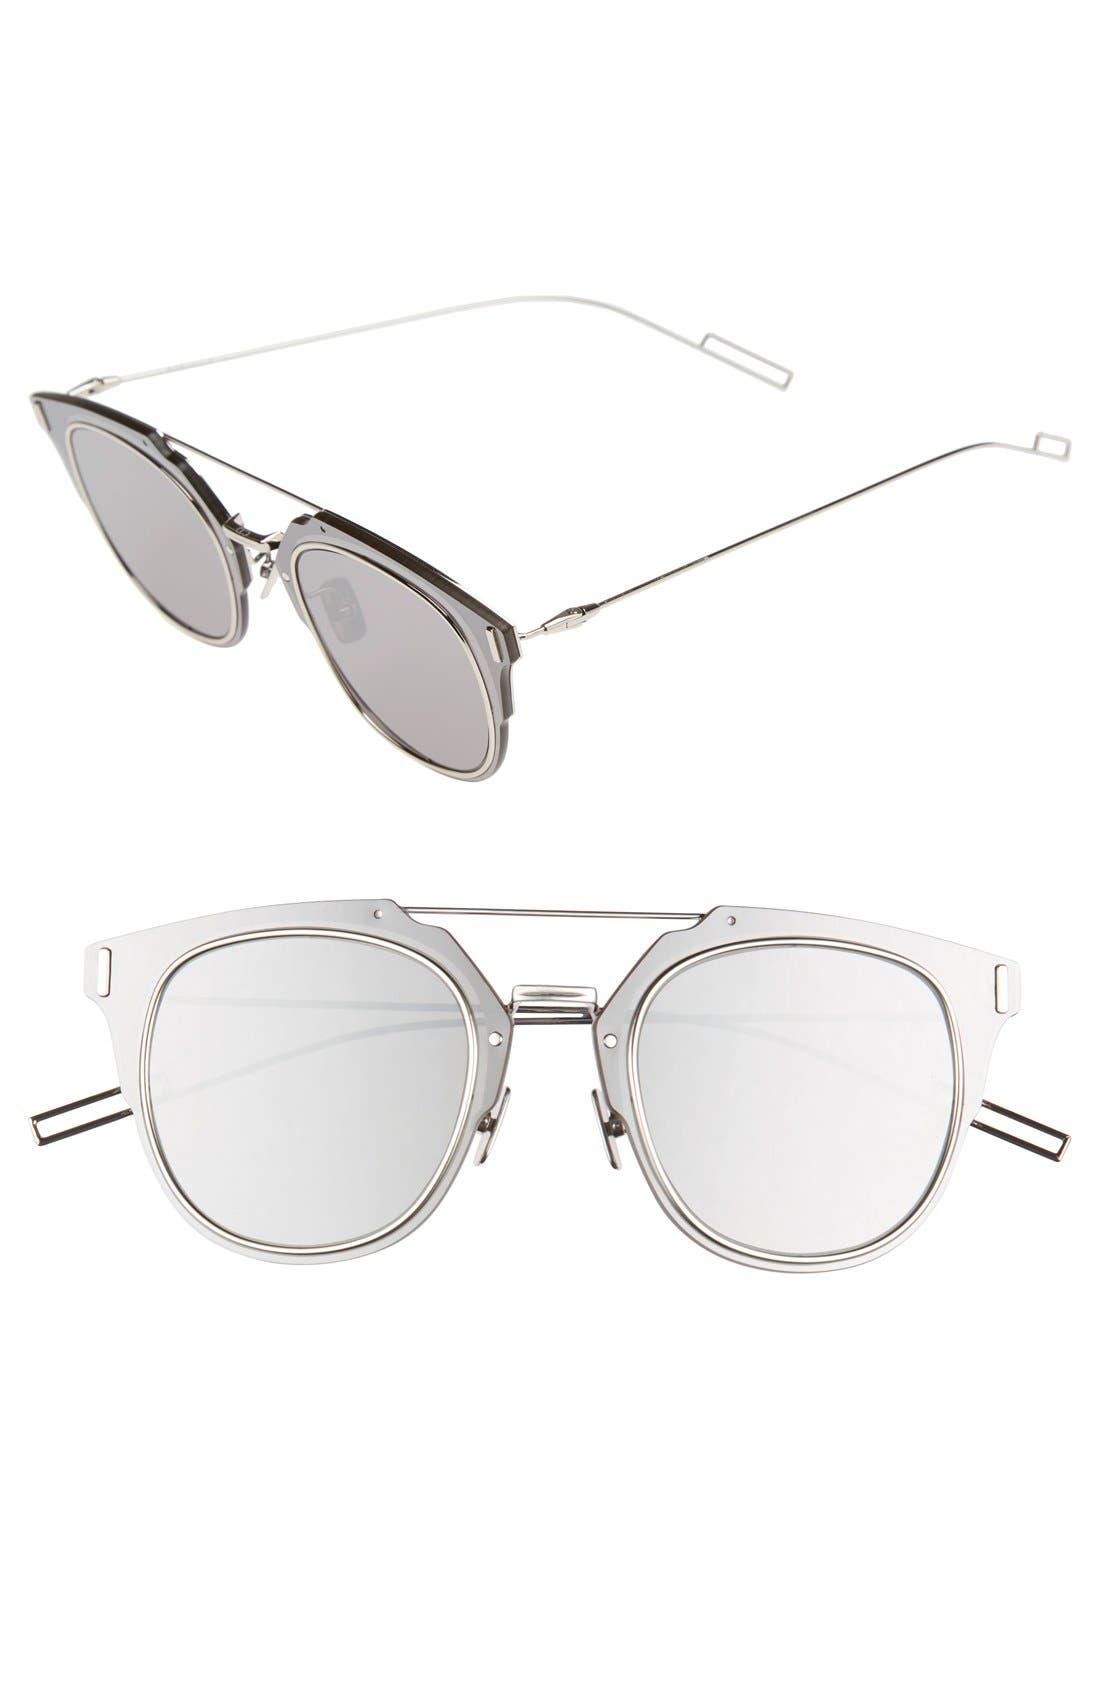 'Composit 1.0S' 62mm Metal Shield Sunglasses,                         Main,                         color, PALLADIUM/ GREY SILVER MIRROR